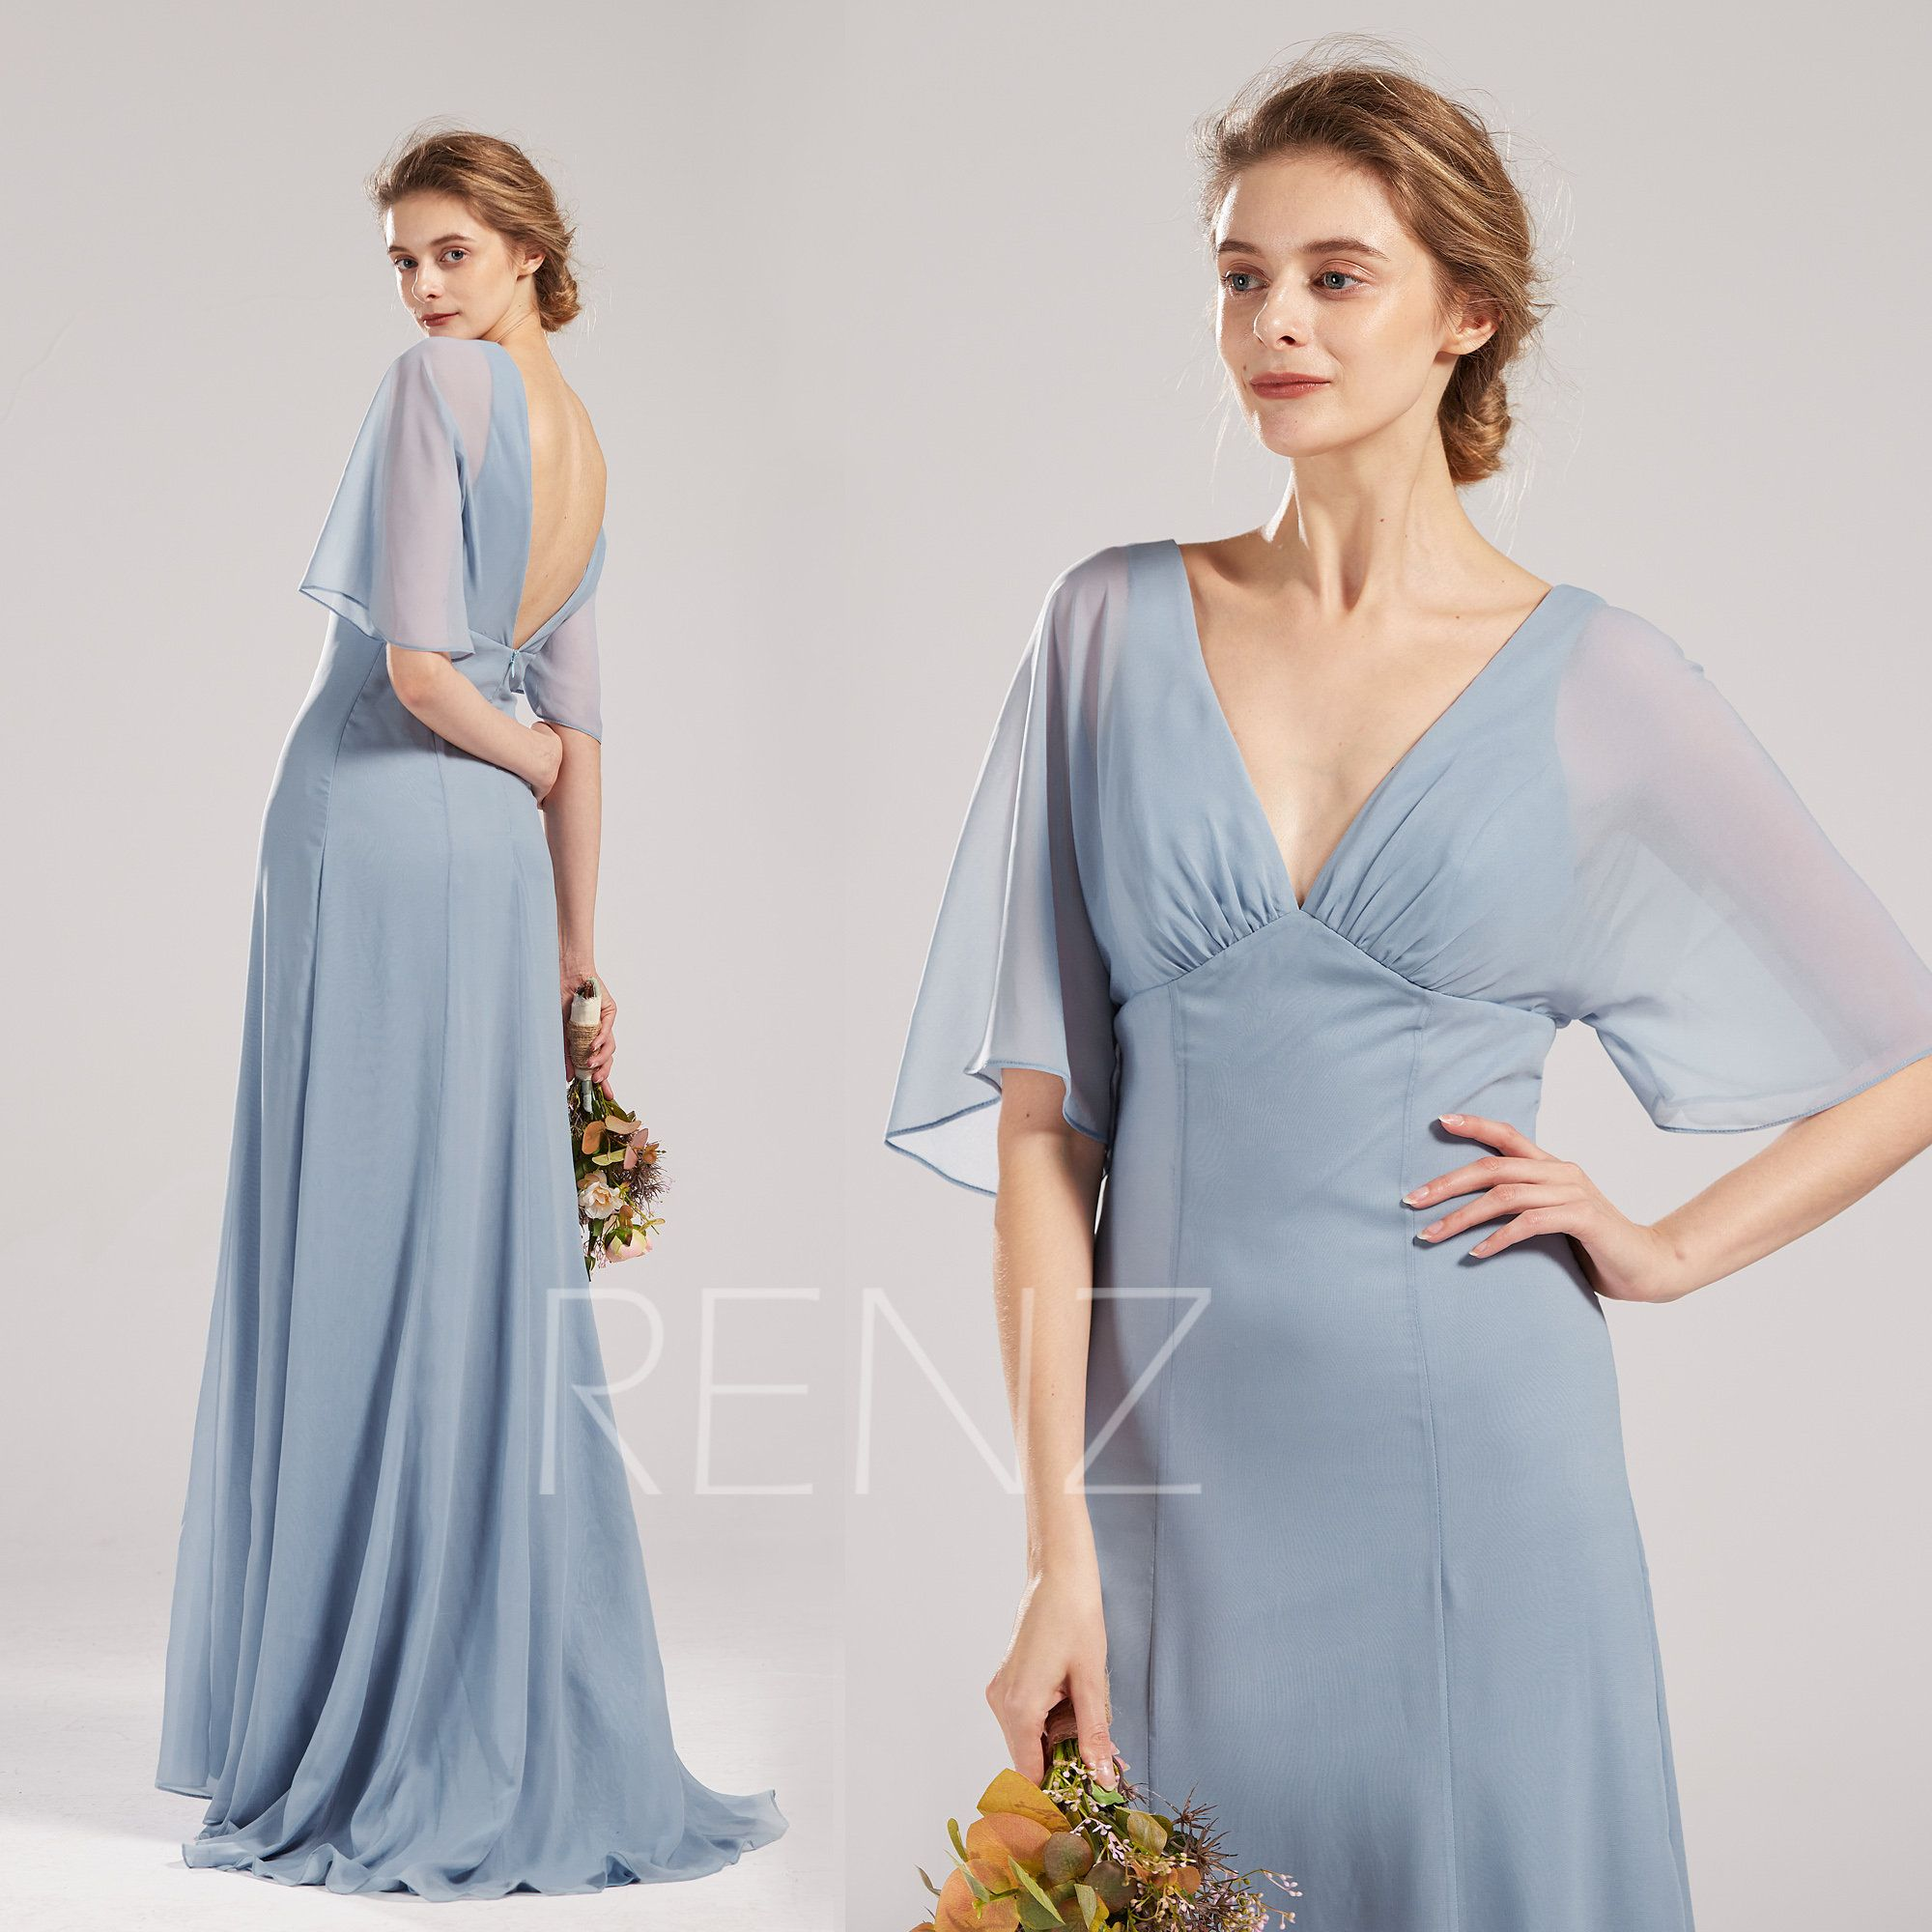 Bridesmaid Dress Pale Steel Blue Prom Dress V Neck Ruffle Half Sleeve Formal Dress Empire Waist A Line L Bridesmaid Dresses Formal Dresses With Sleeves Dresses [ 2000 x 2000 Pixel ]